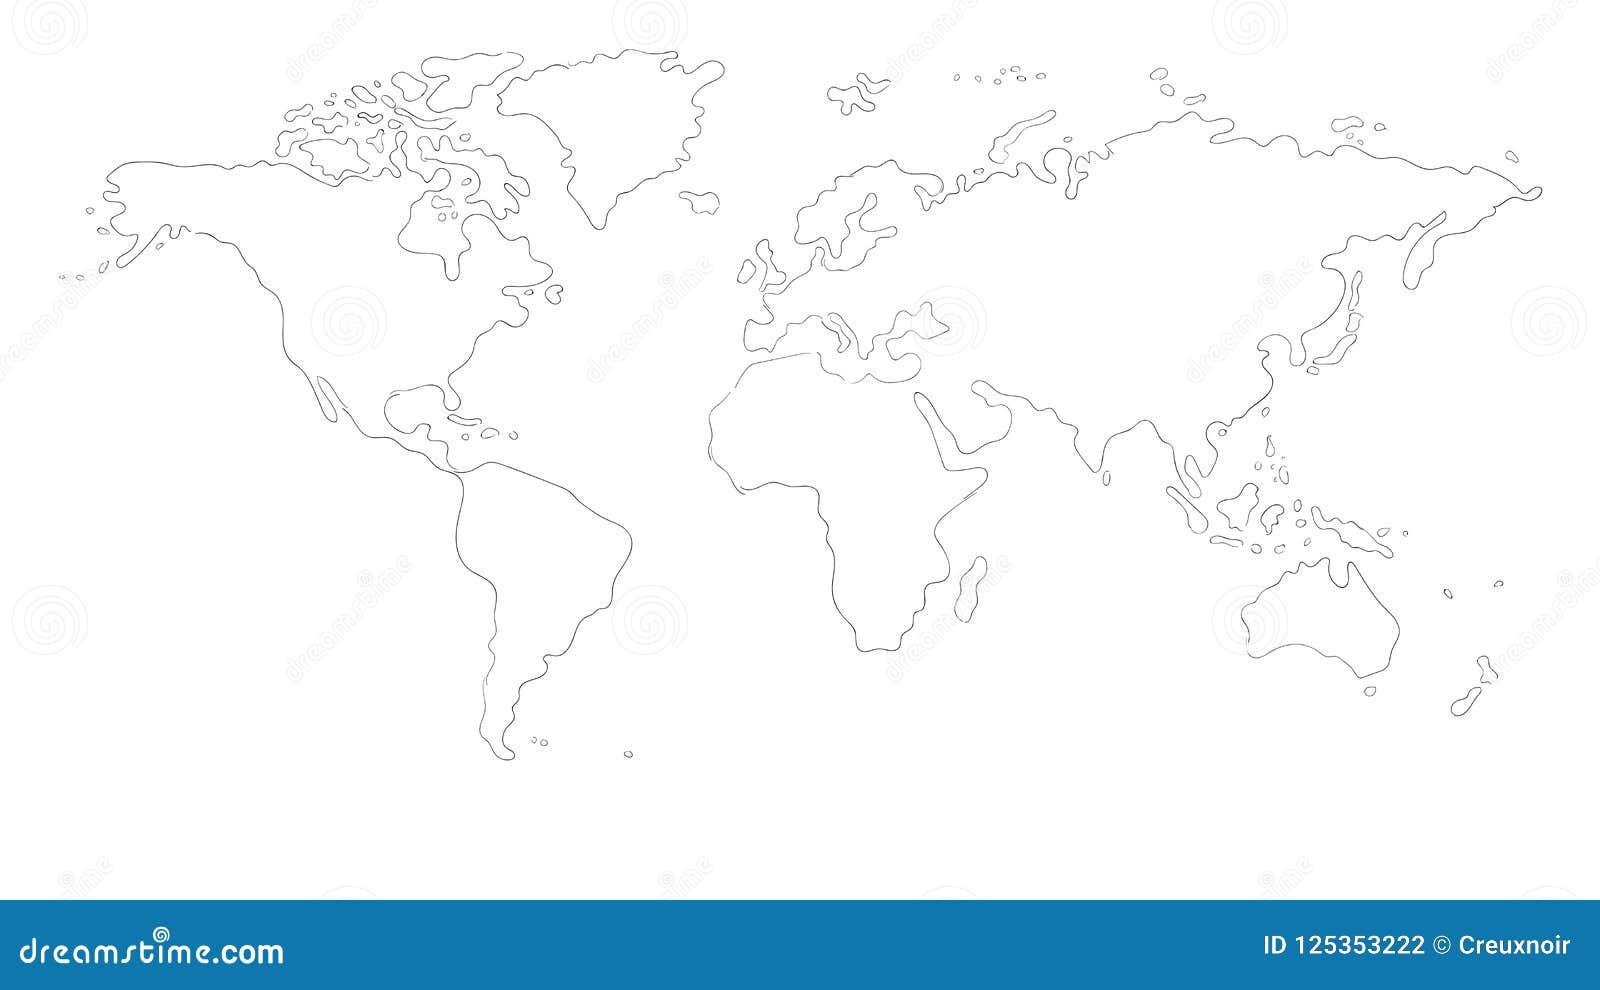 Hand drawn world map stock illustration. Illustration of sketch ...